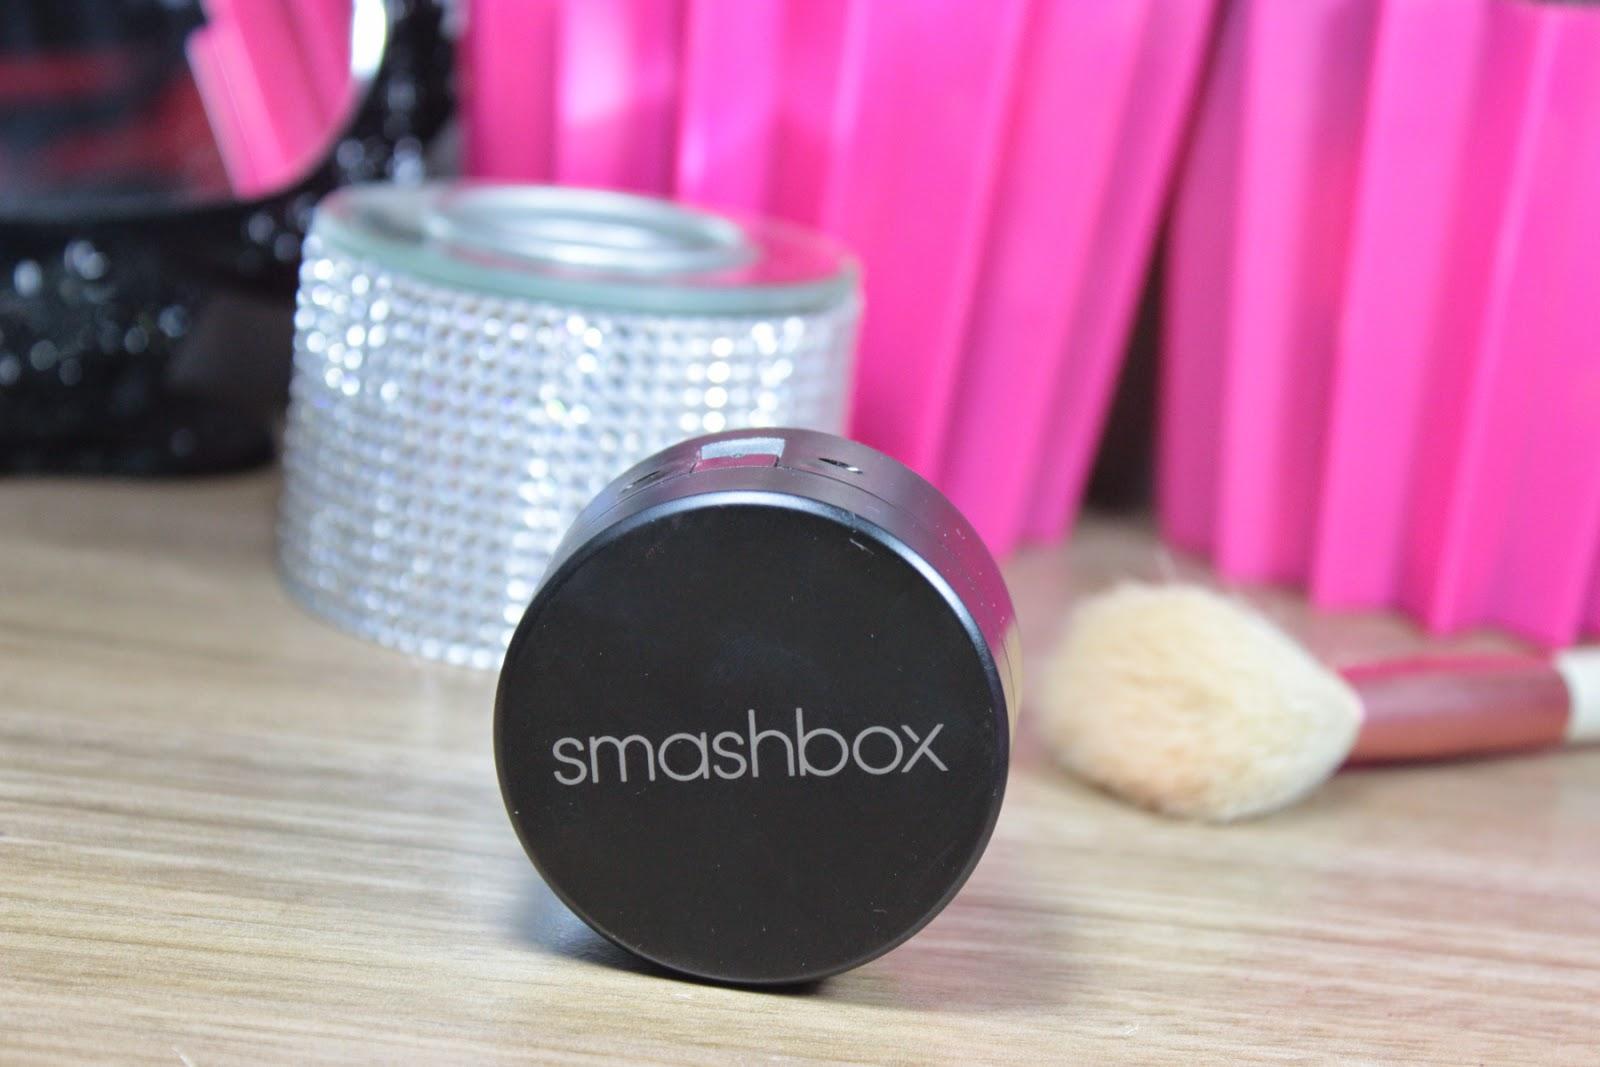 smashbox, produto recebido, halo long wear, blush, blissful, halo, alta pigmentação, sephora, swatche,